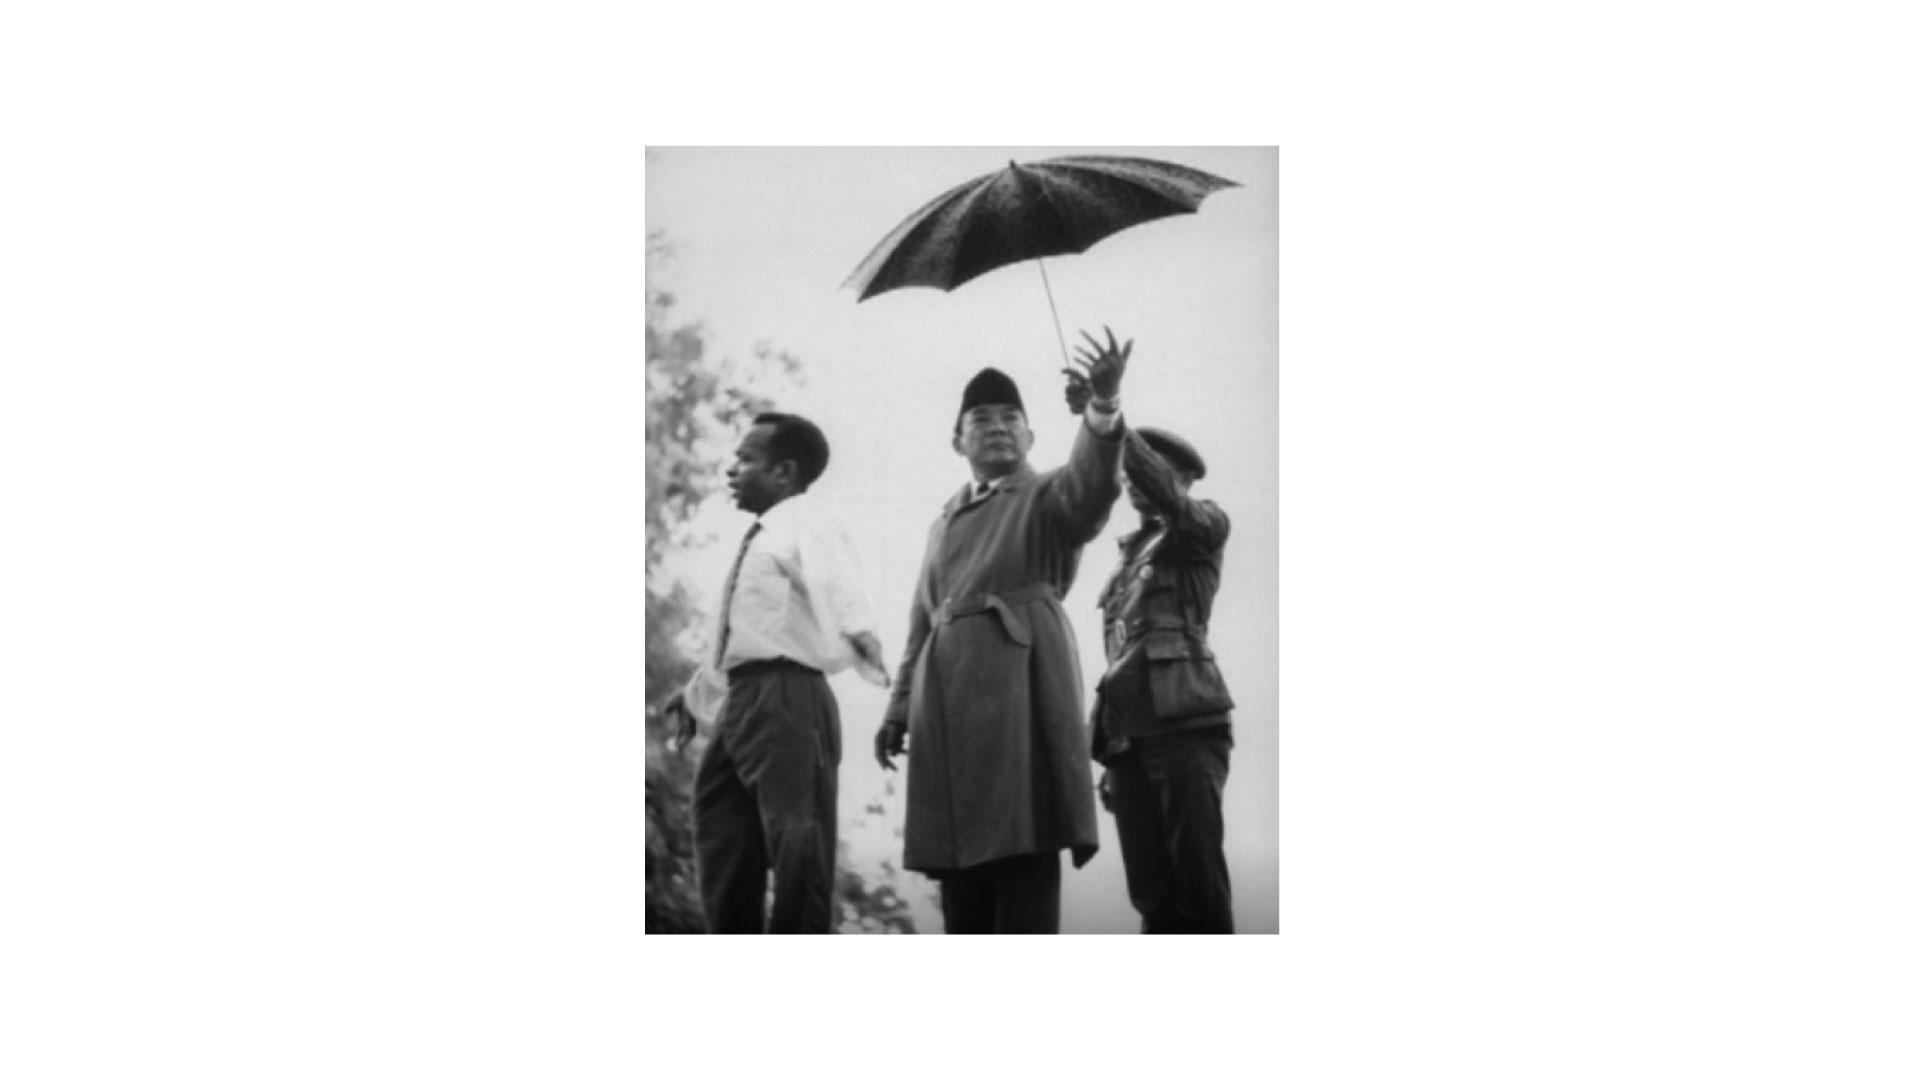 Kunjungan Presiden Soekarno ke Jayapura 07 Mei 1963